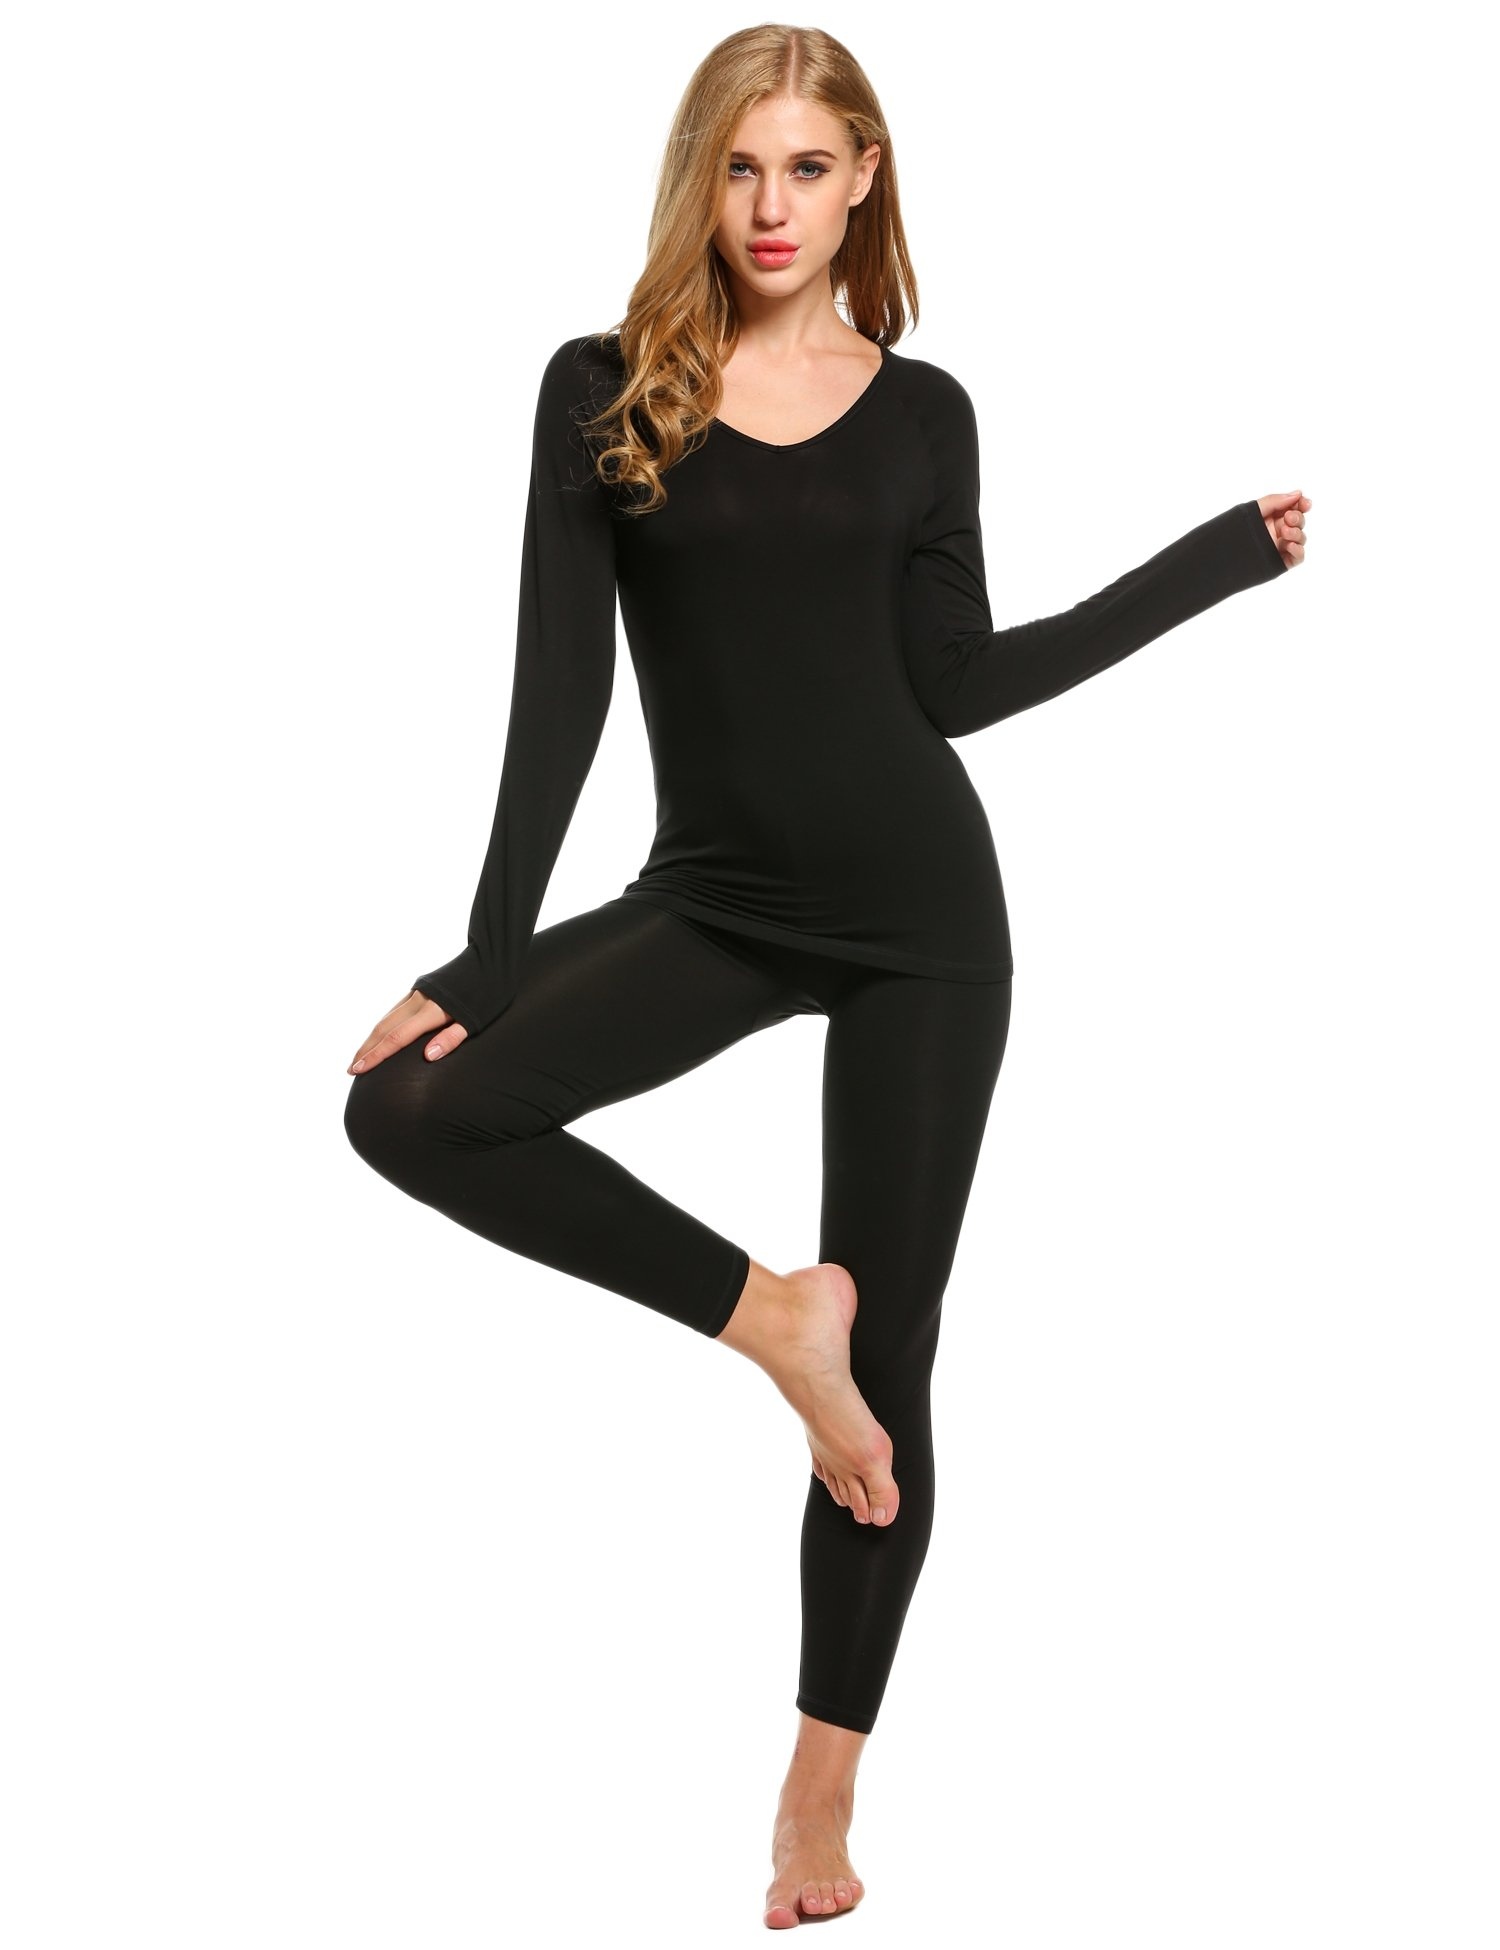 Ekouaer Women Thermal Underwear Set Solid V-Neck Long Sleeve Top and Long Pants Bottom Sleepwear by Ekouaer (Image #3)